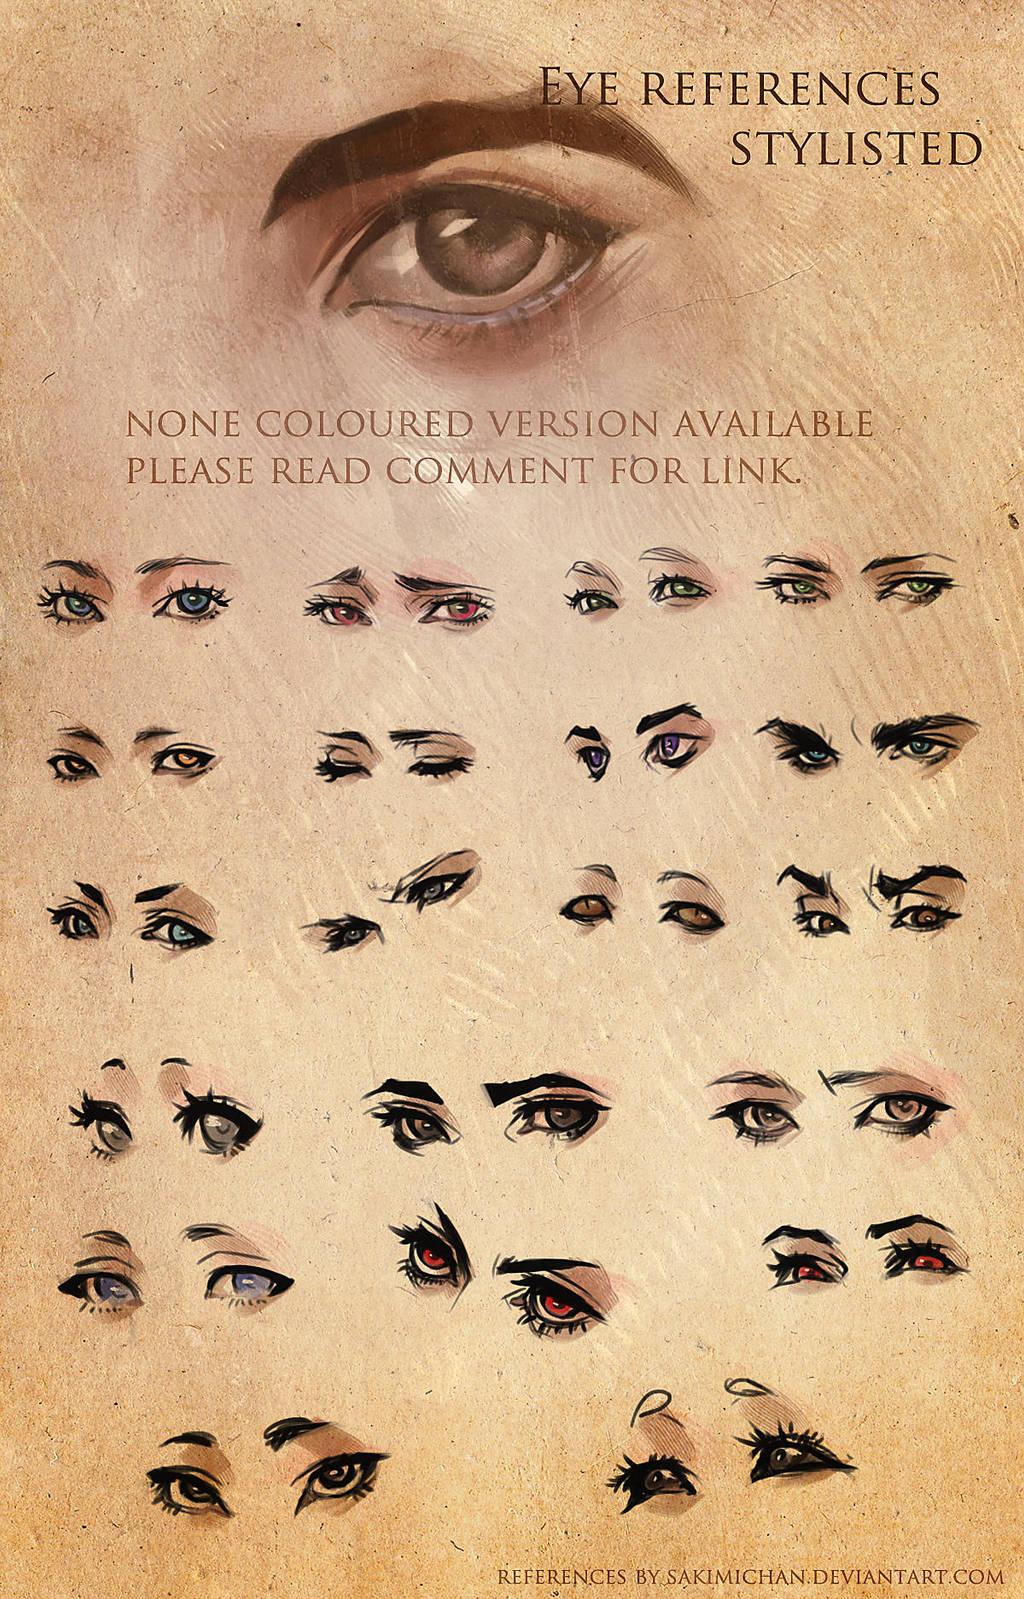 Stylized Eye References by sakimichan